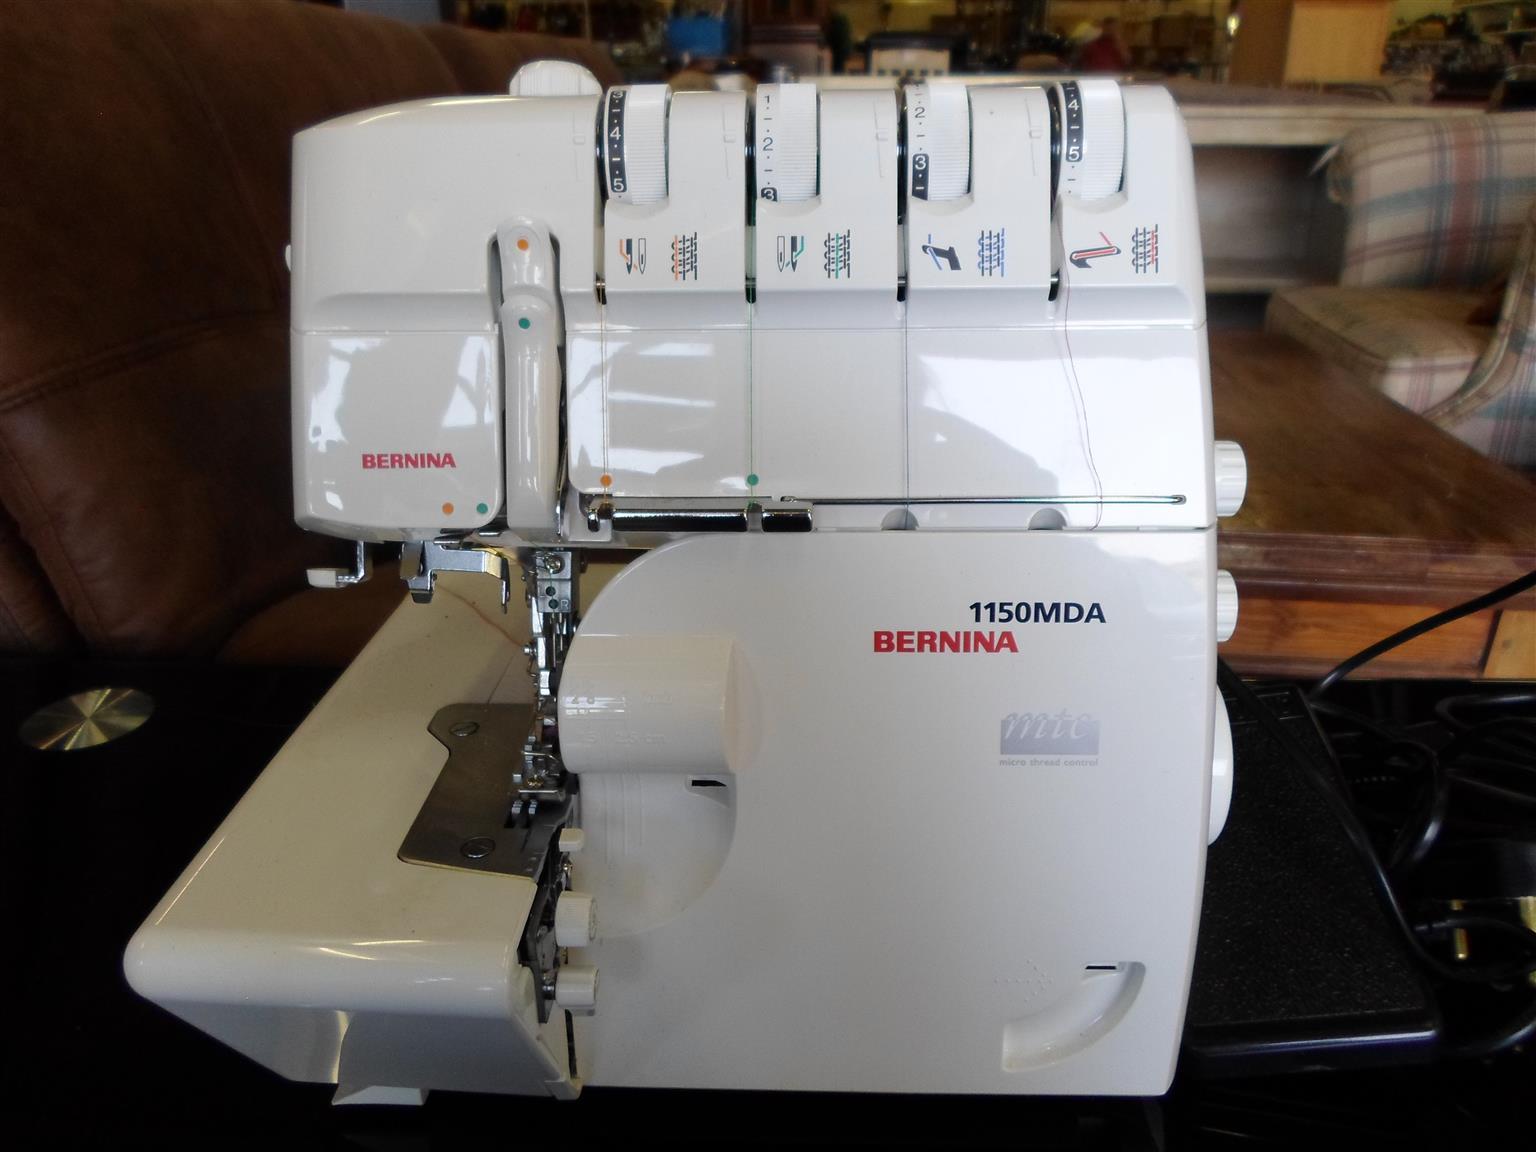 Bernina 1150MDA Sewing Machine